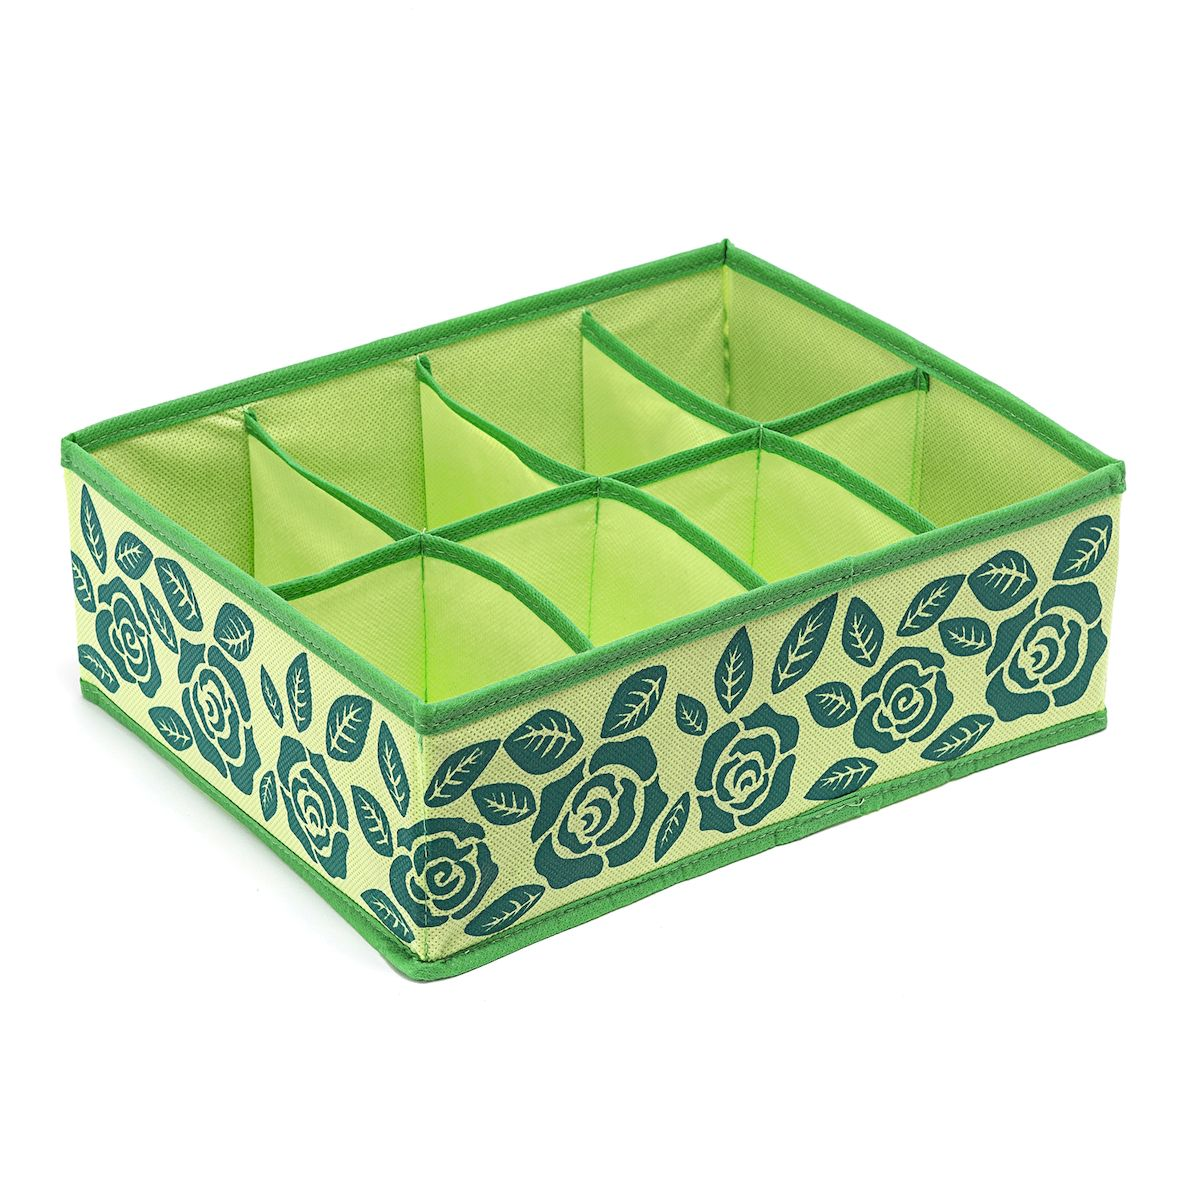 Органайзер для хранения Homsu Green Flower, 8 секций , 31 х 24 х 11 см набор органайзеров homsu ностальгия с крышкой 31 х 24 х 11 см 3 шт